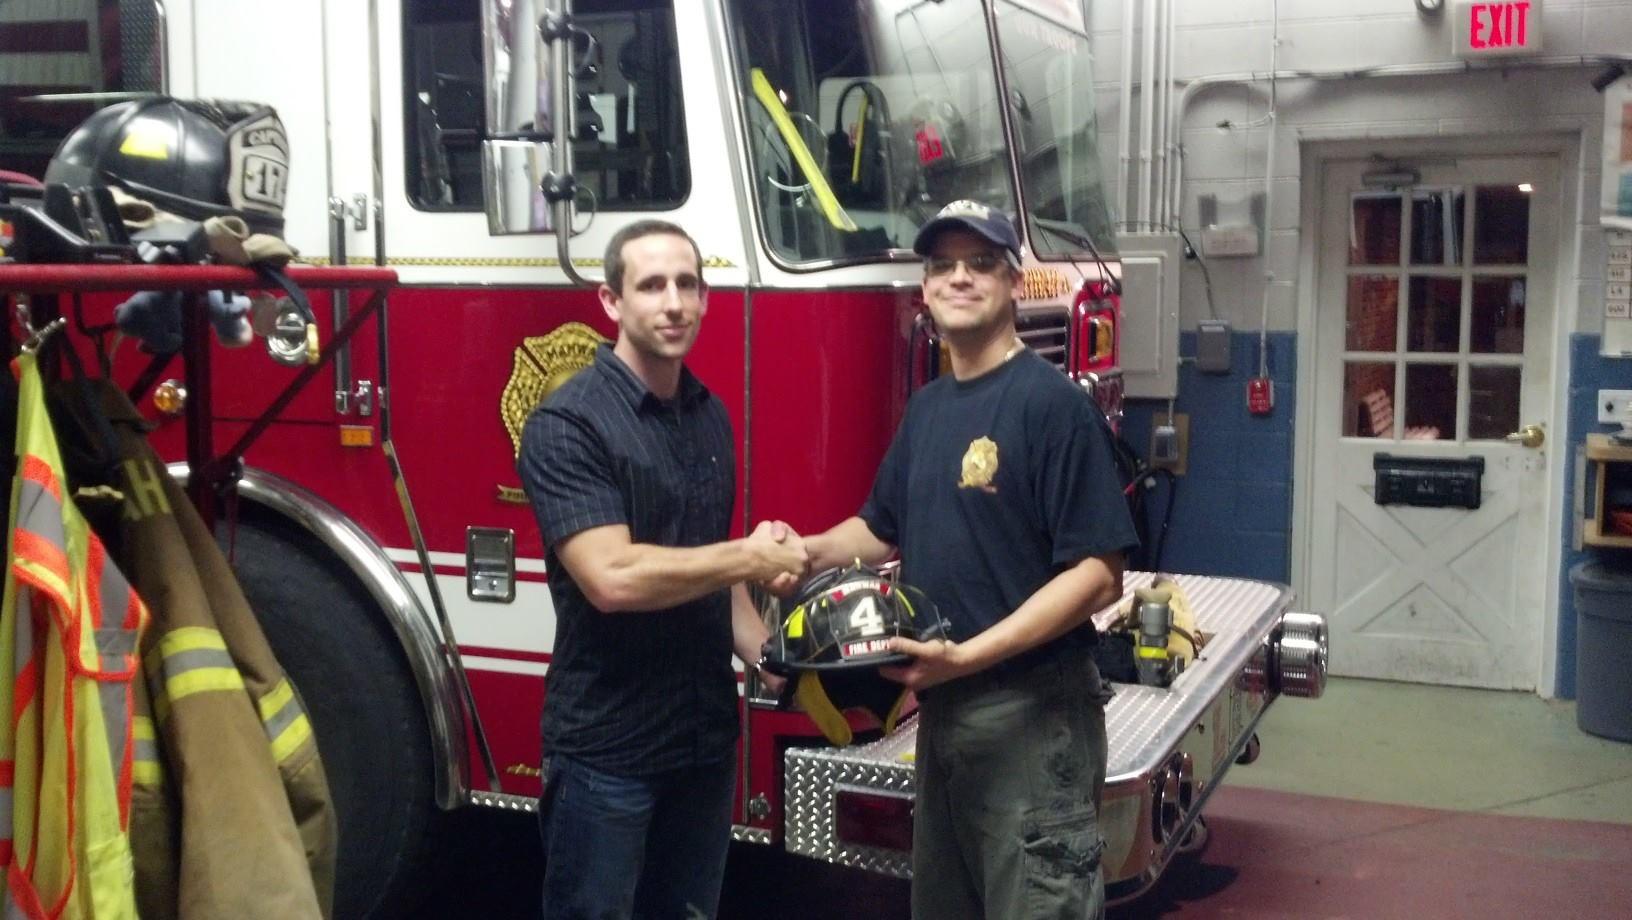 Helmet Presentation for Firefighter Quick